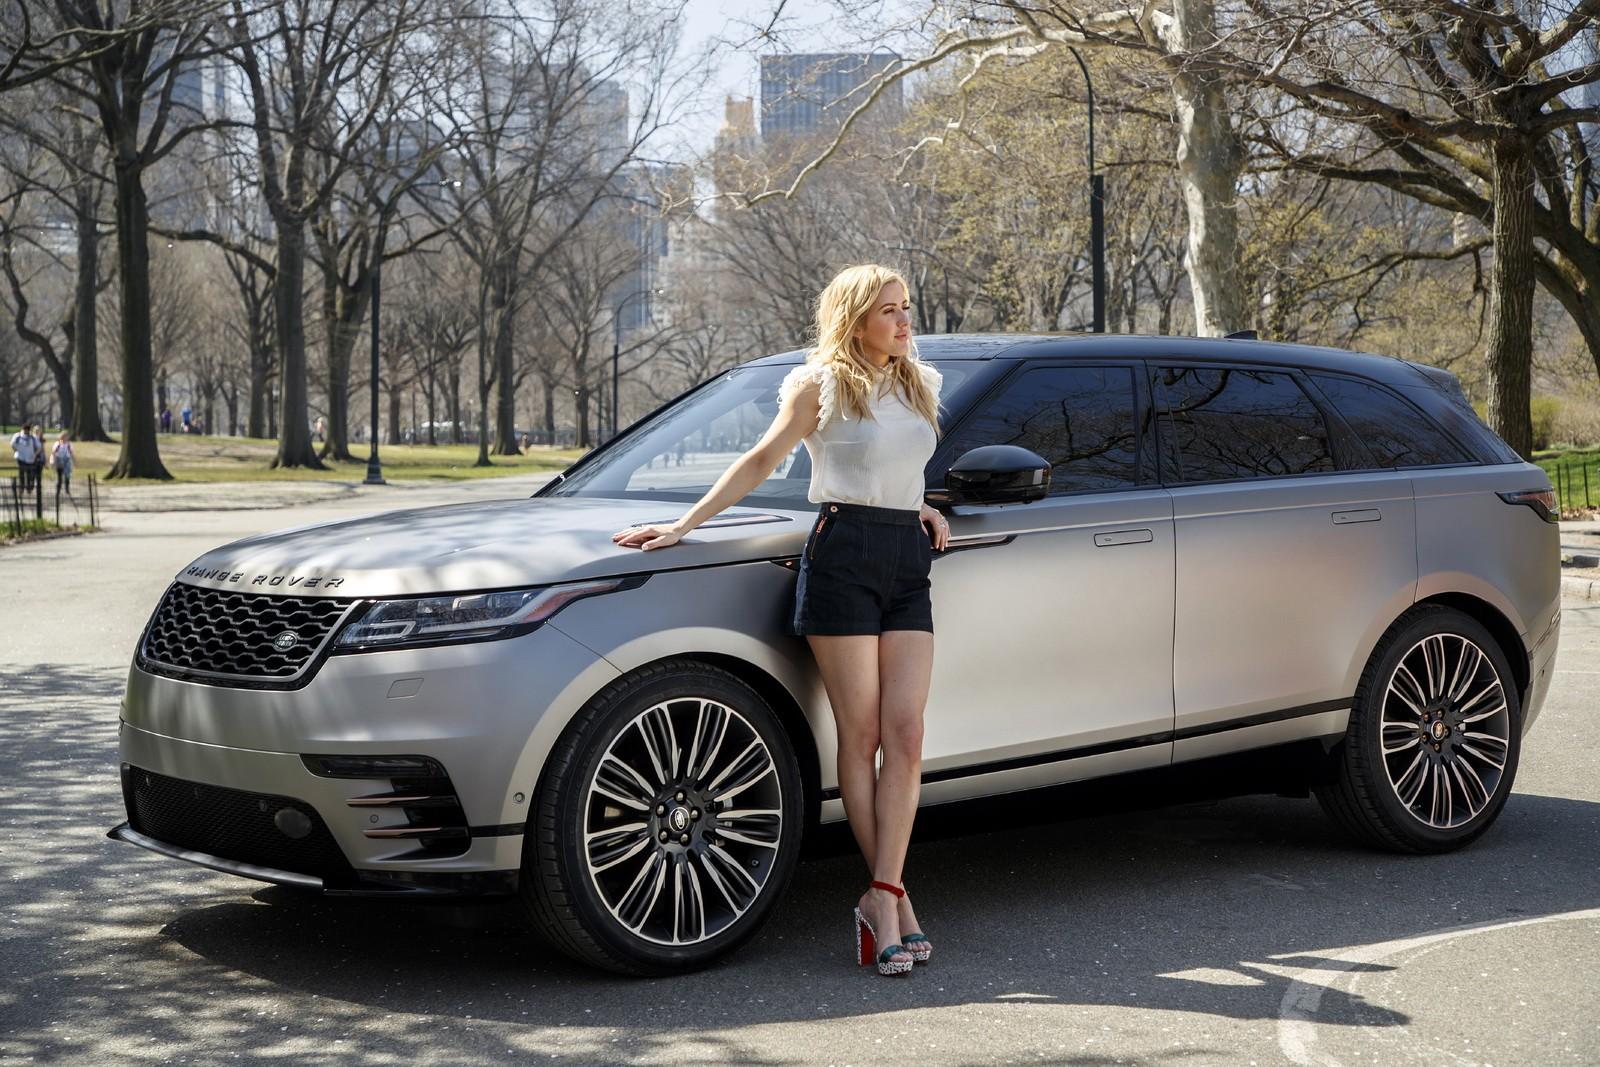 Ford Edge Dimensions >> Range Rover Velar New York Debut Features Ellie Goulding - autoevolution